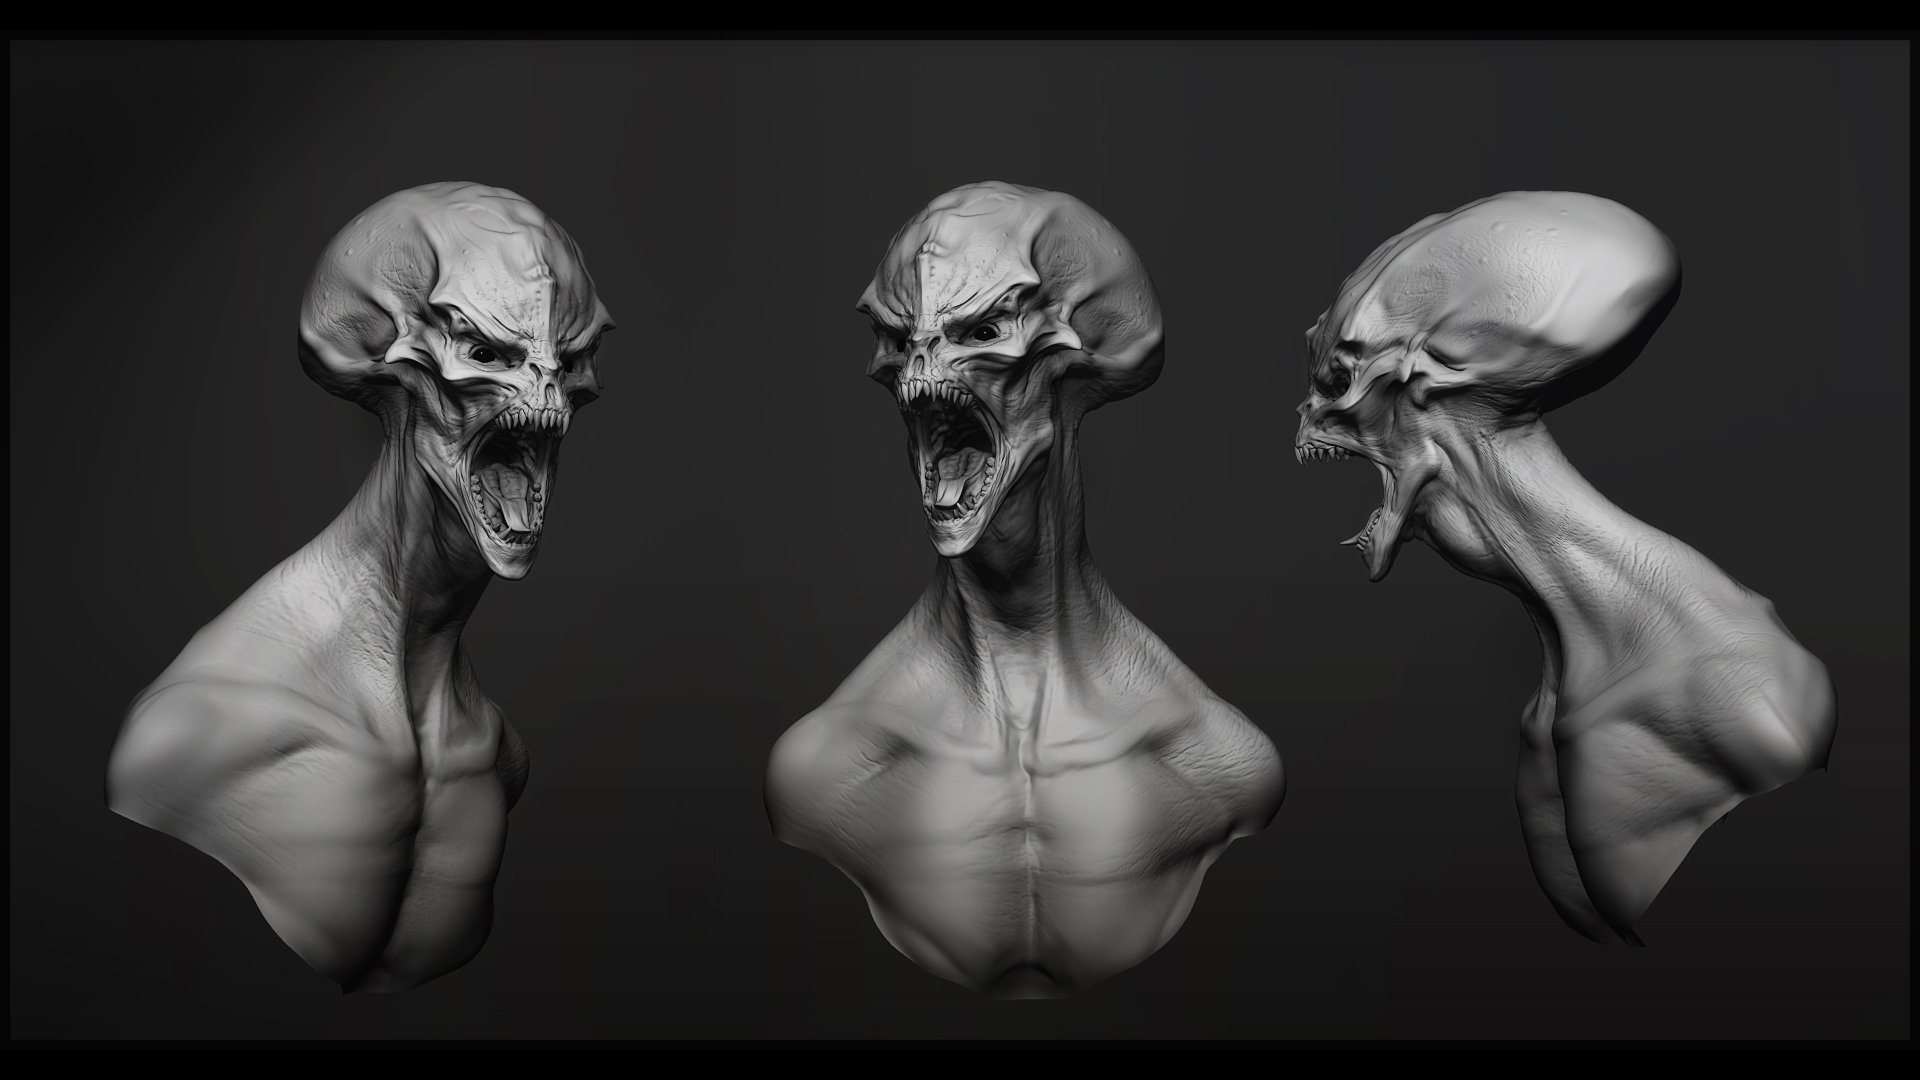 Alien head grescales